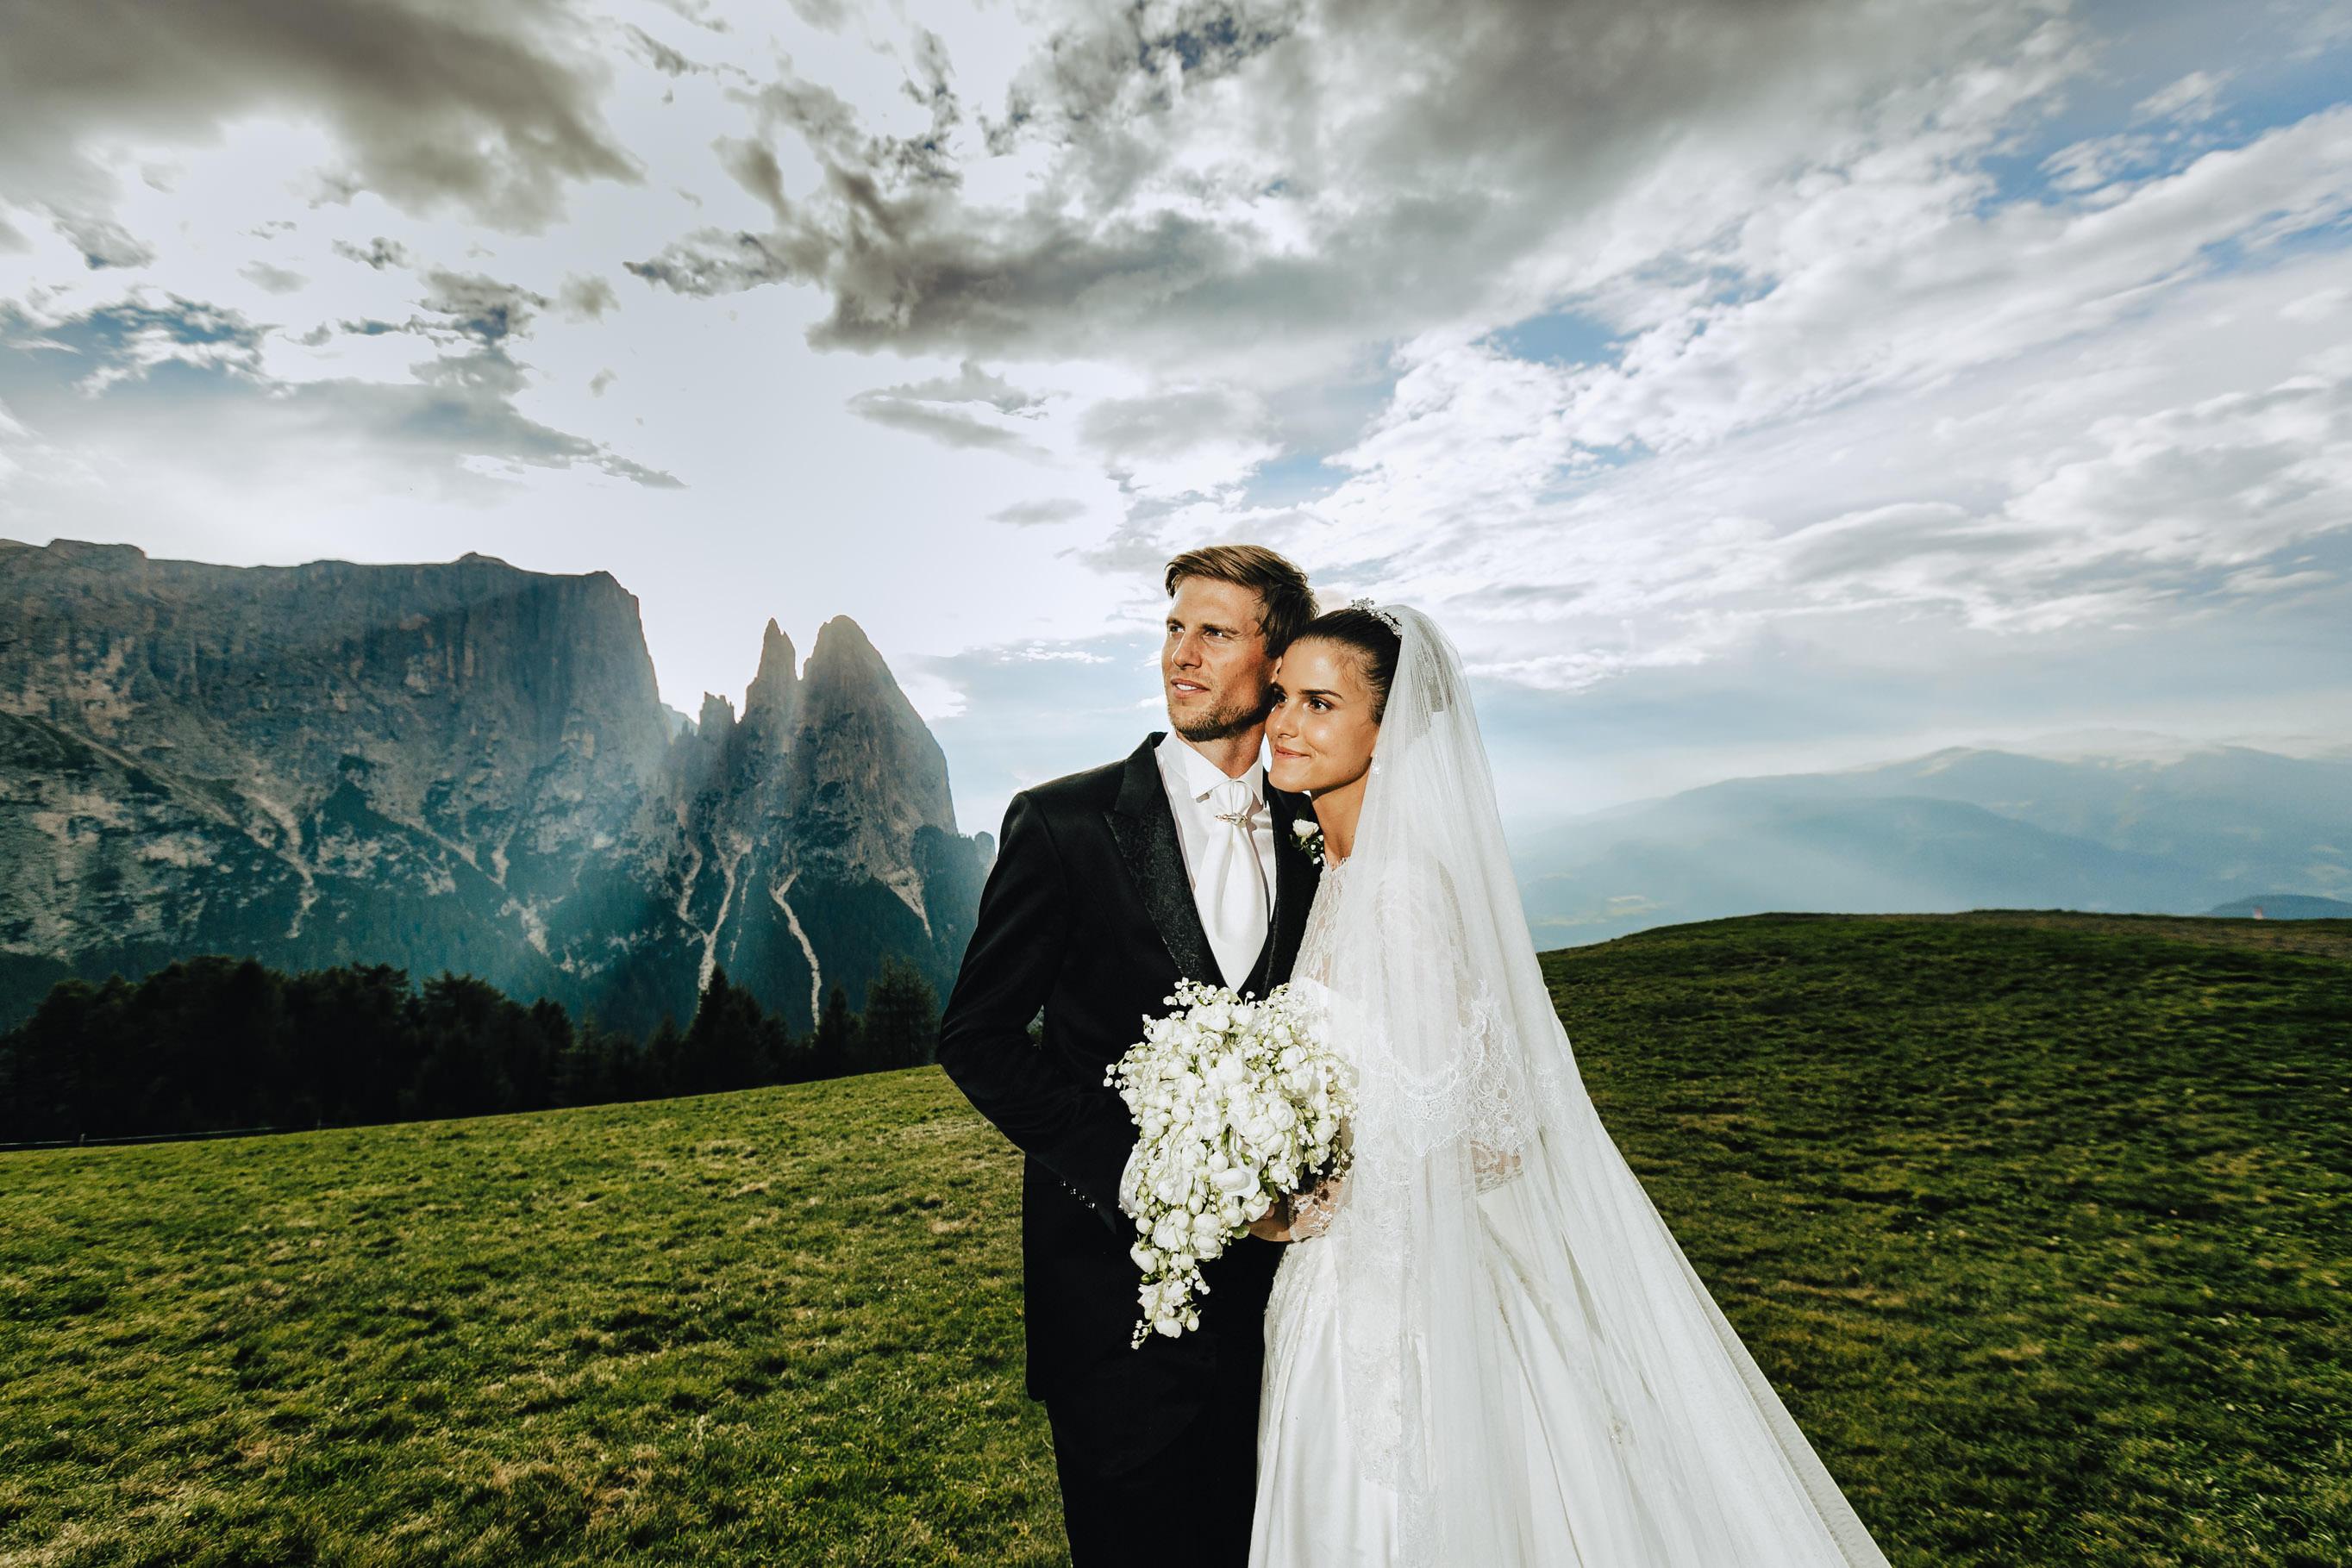 wedding italian alps couple dolomites